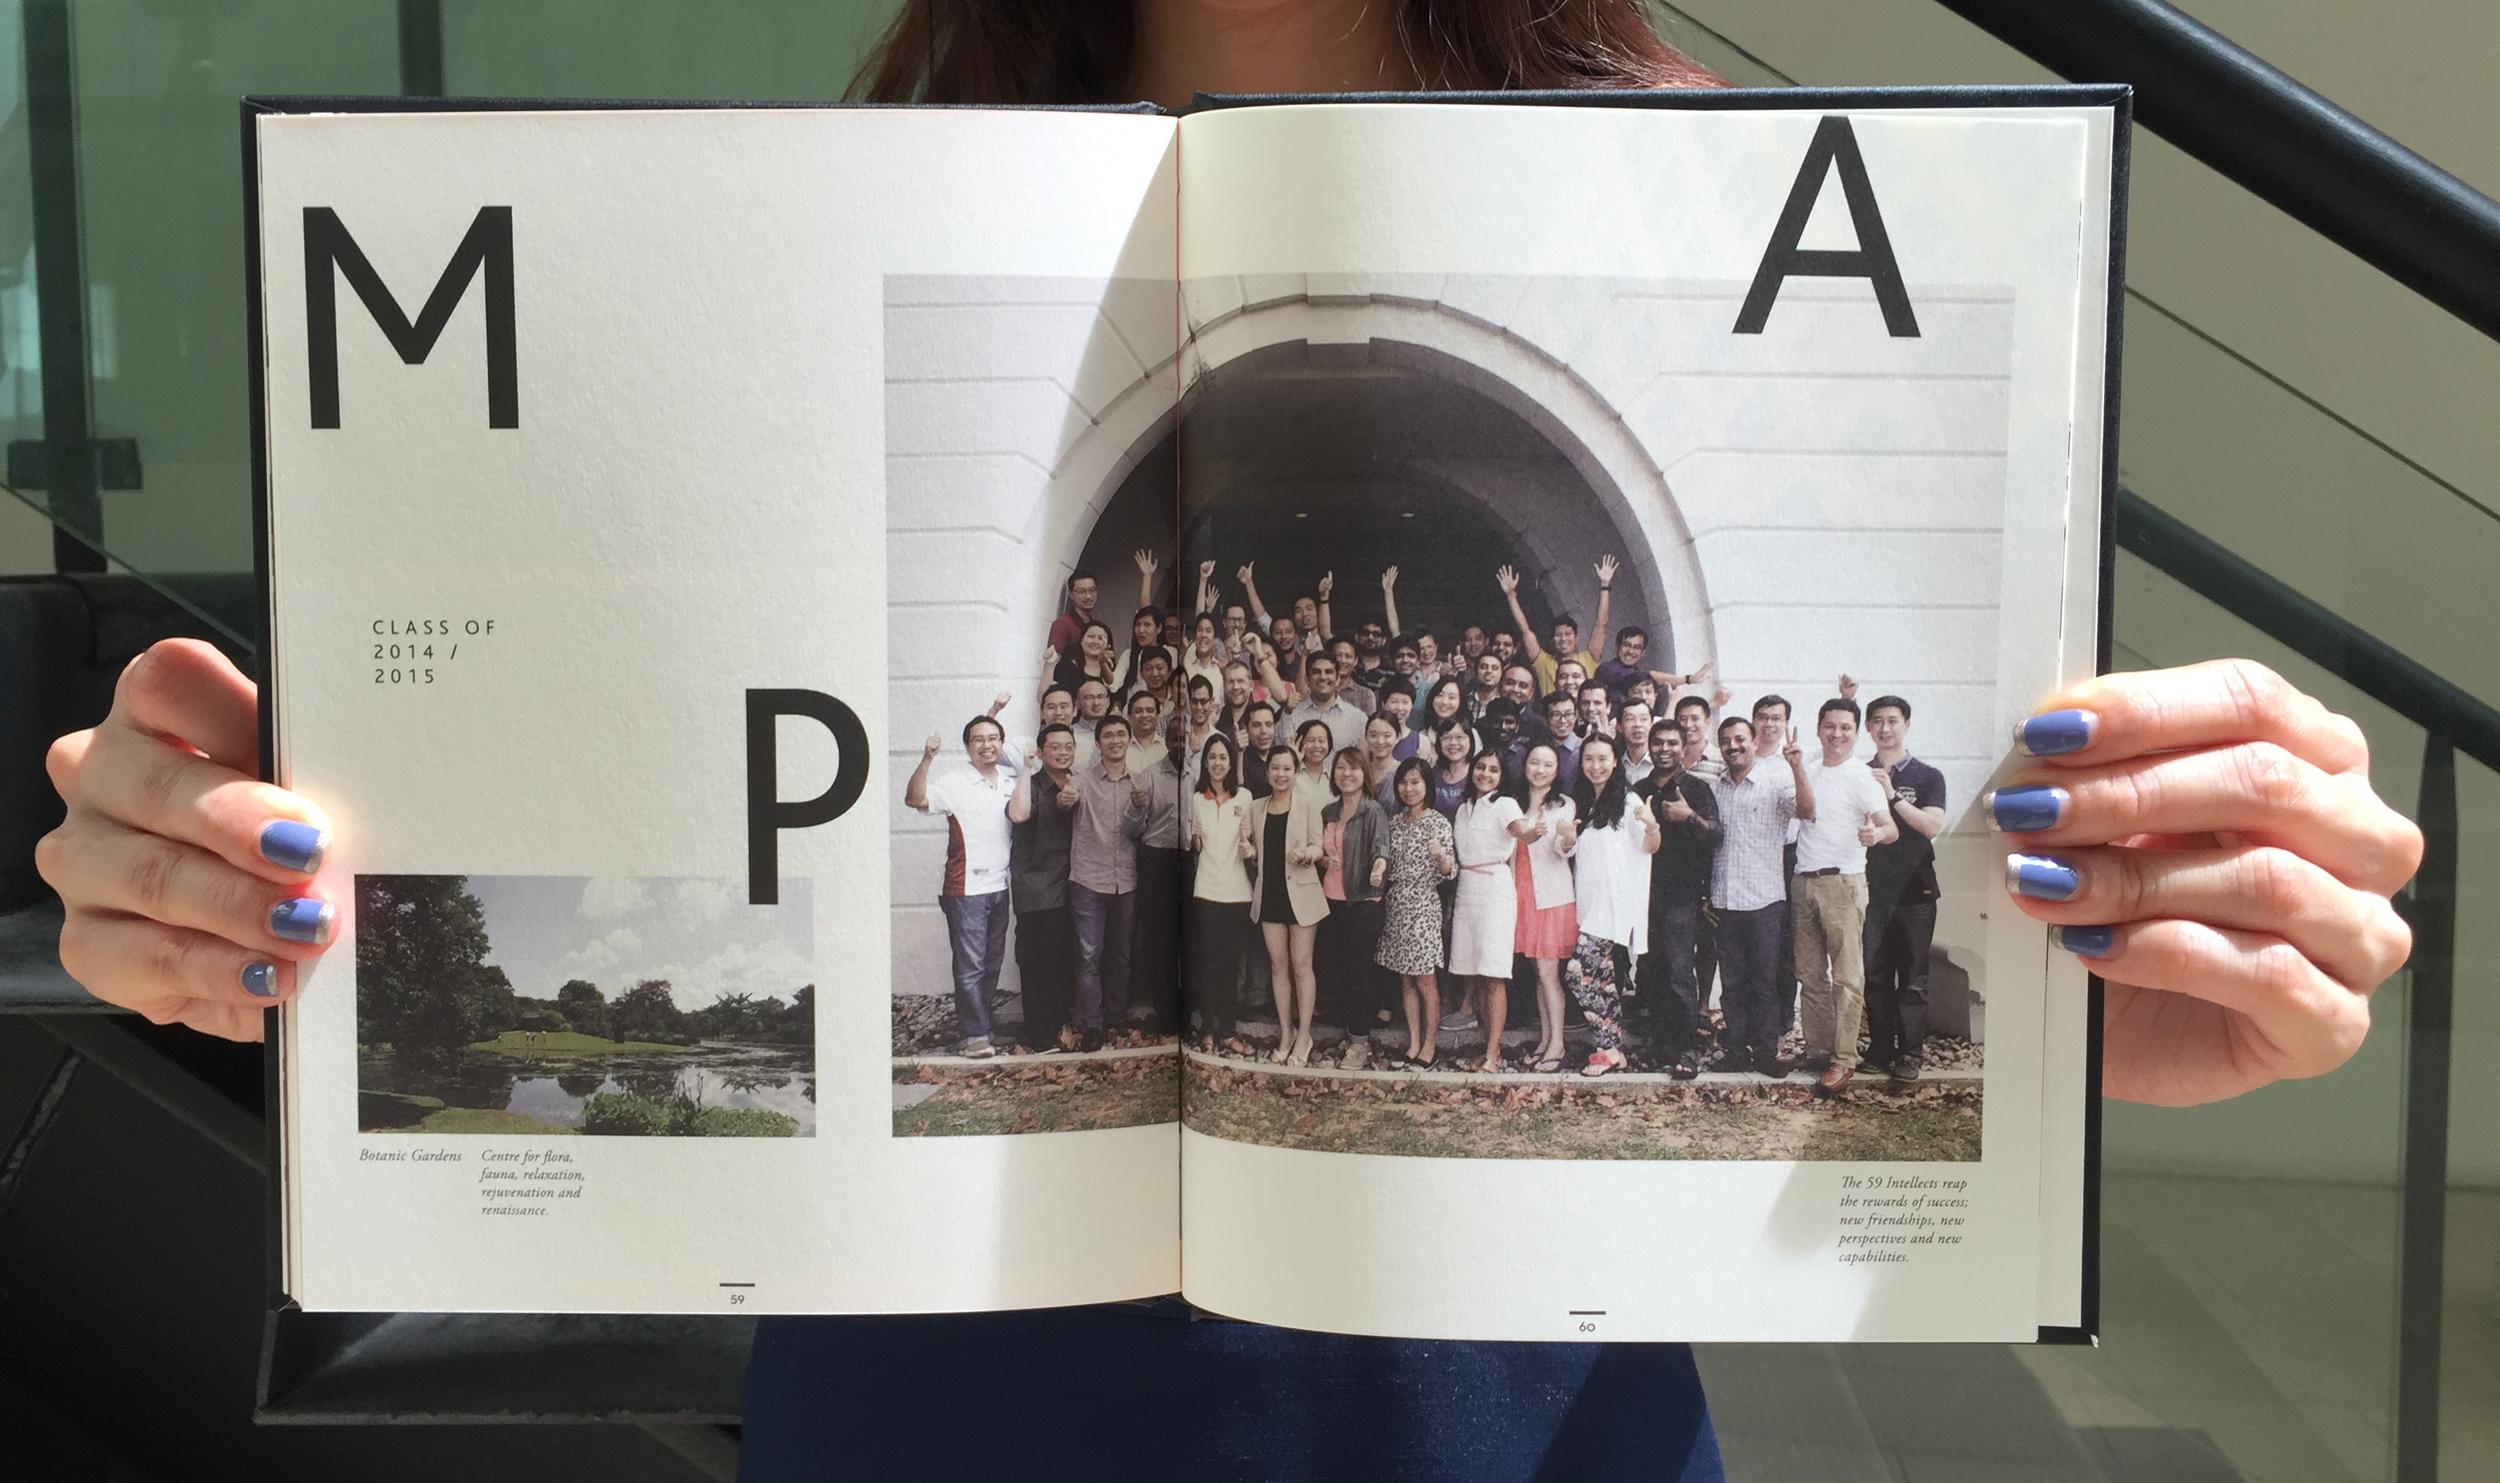 lee kuan yew school of public policy yearbook 15.jpg